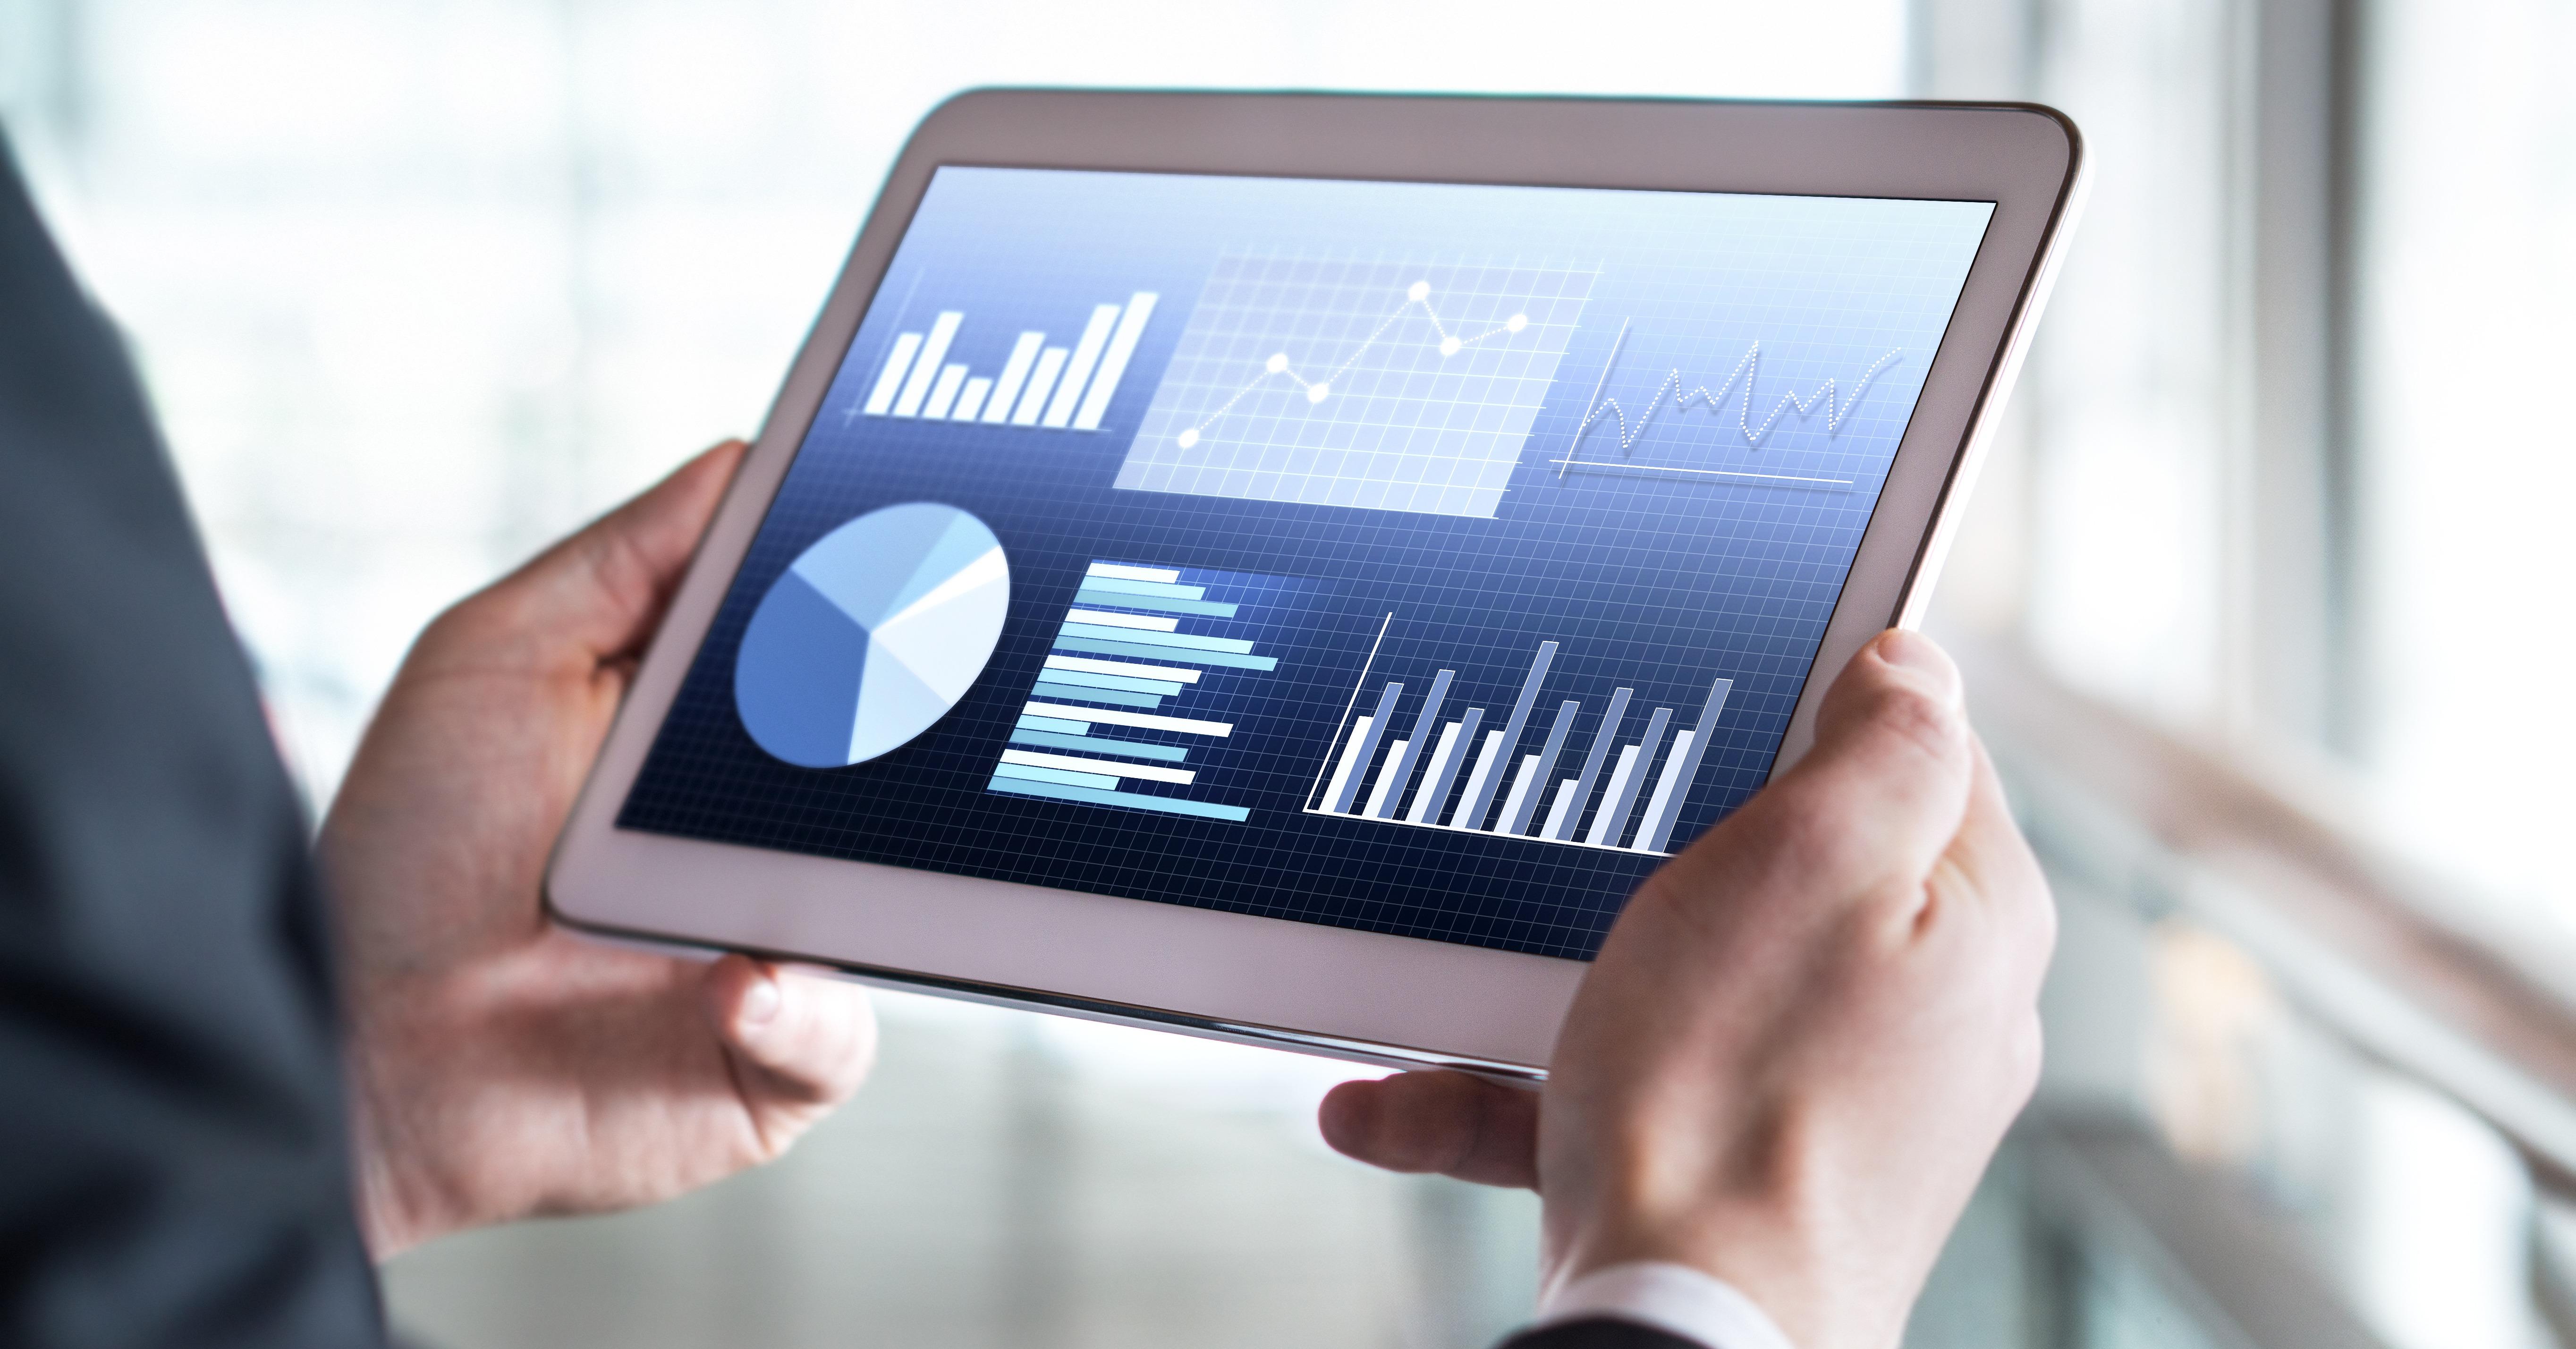 professional services project management